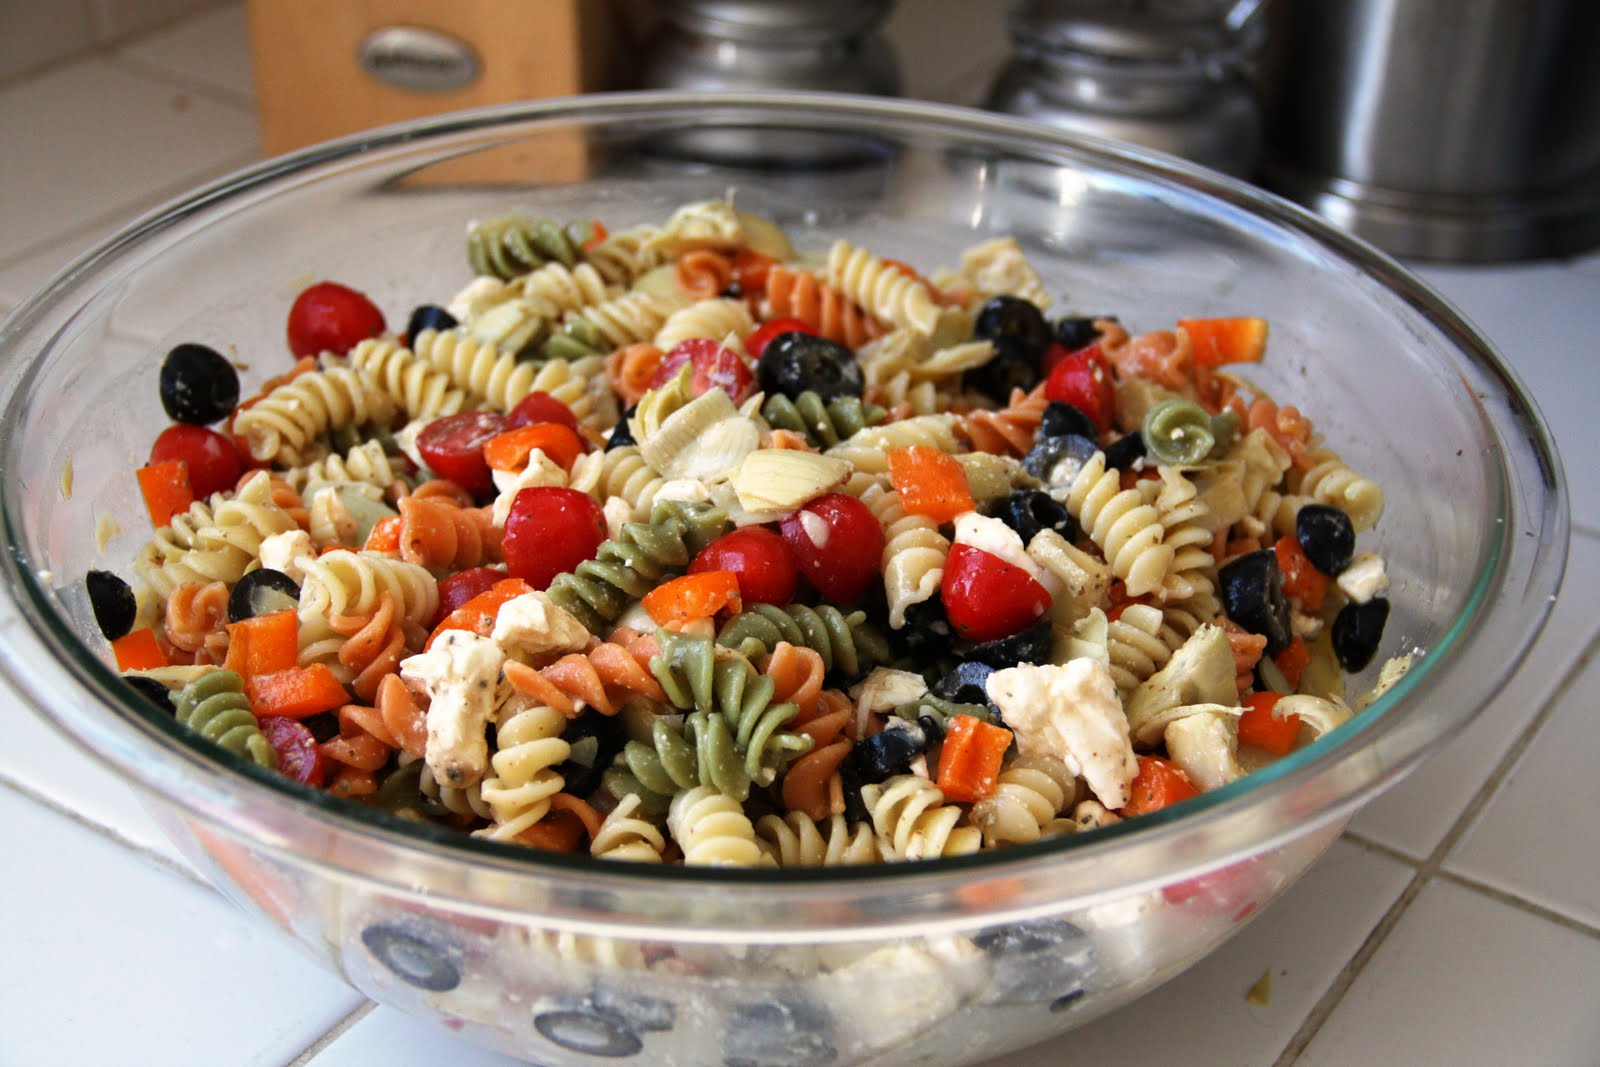 Summer Pasta Salad Gluten Free Option Vegan Vegetarian Gastronomy